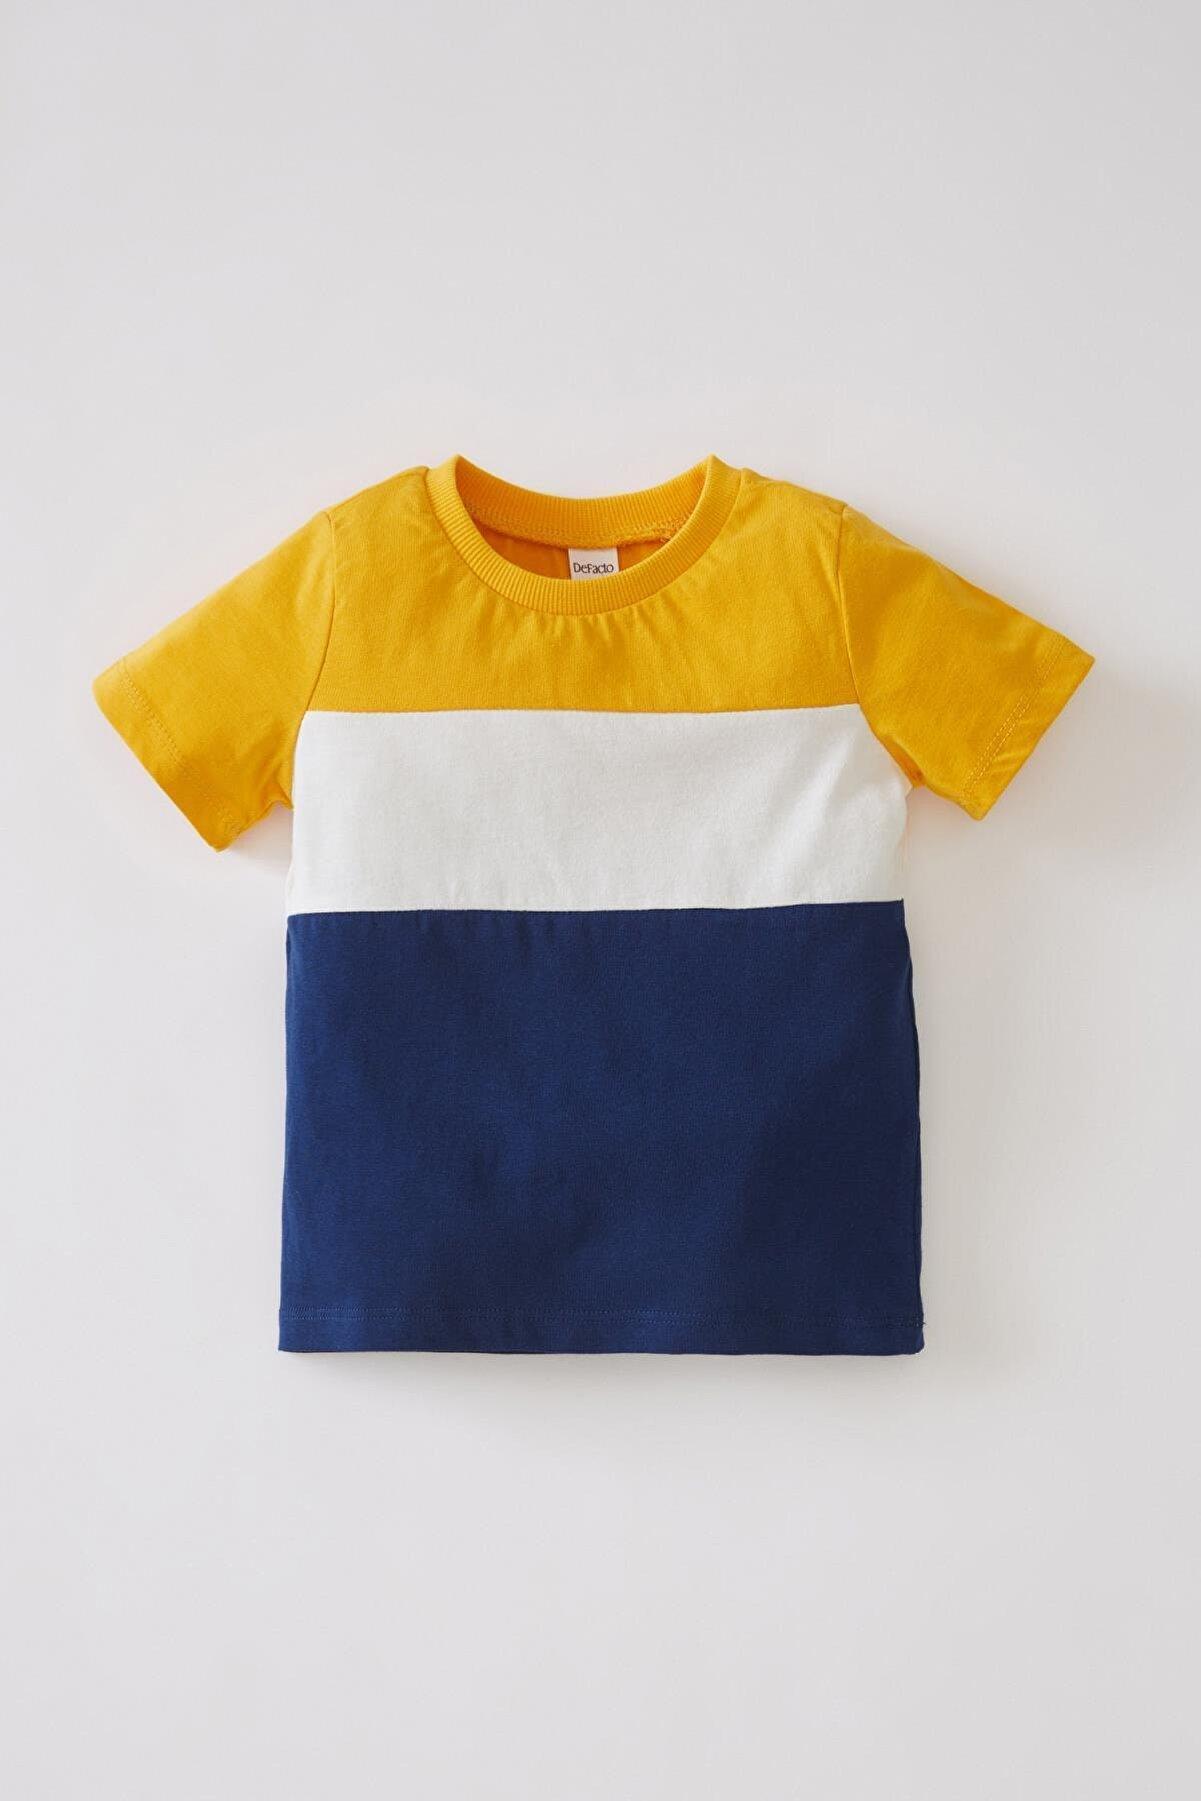 Defacto Unisex Renk Bloklu Kısa Kollu Pamuklu Tişört